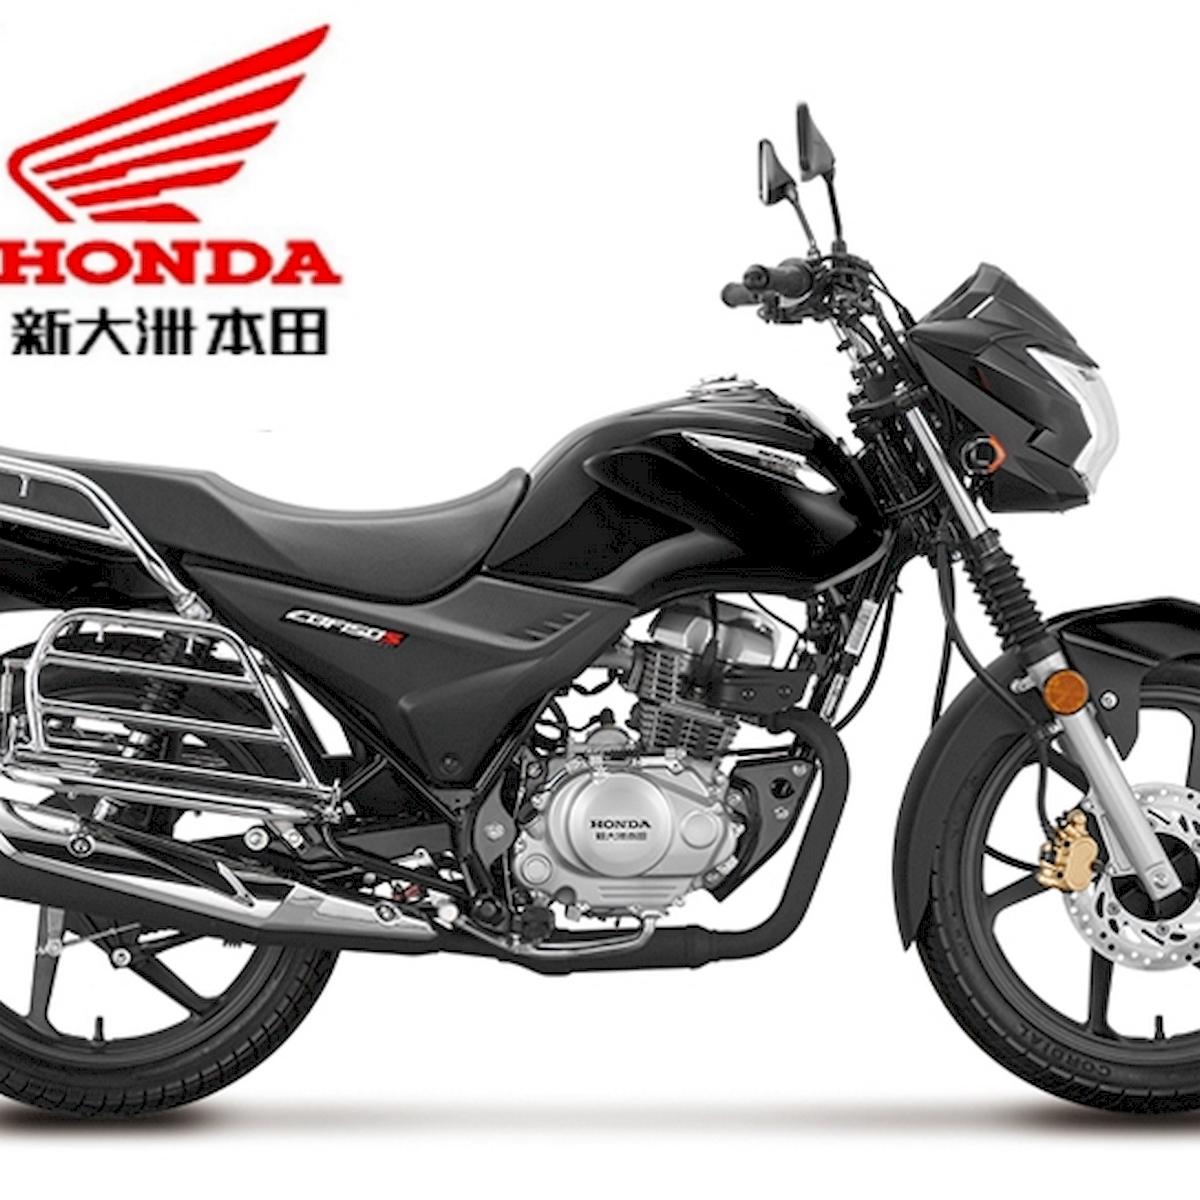 Image of HONDA CBF 150